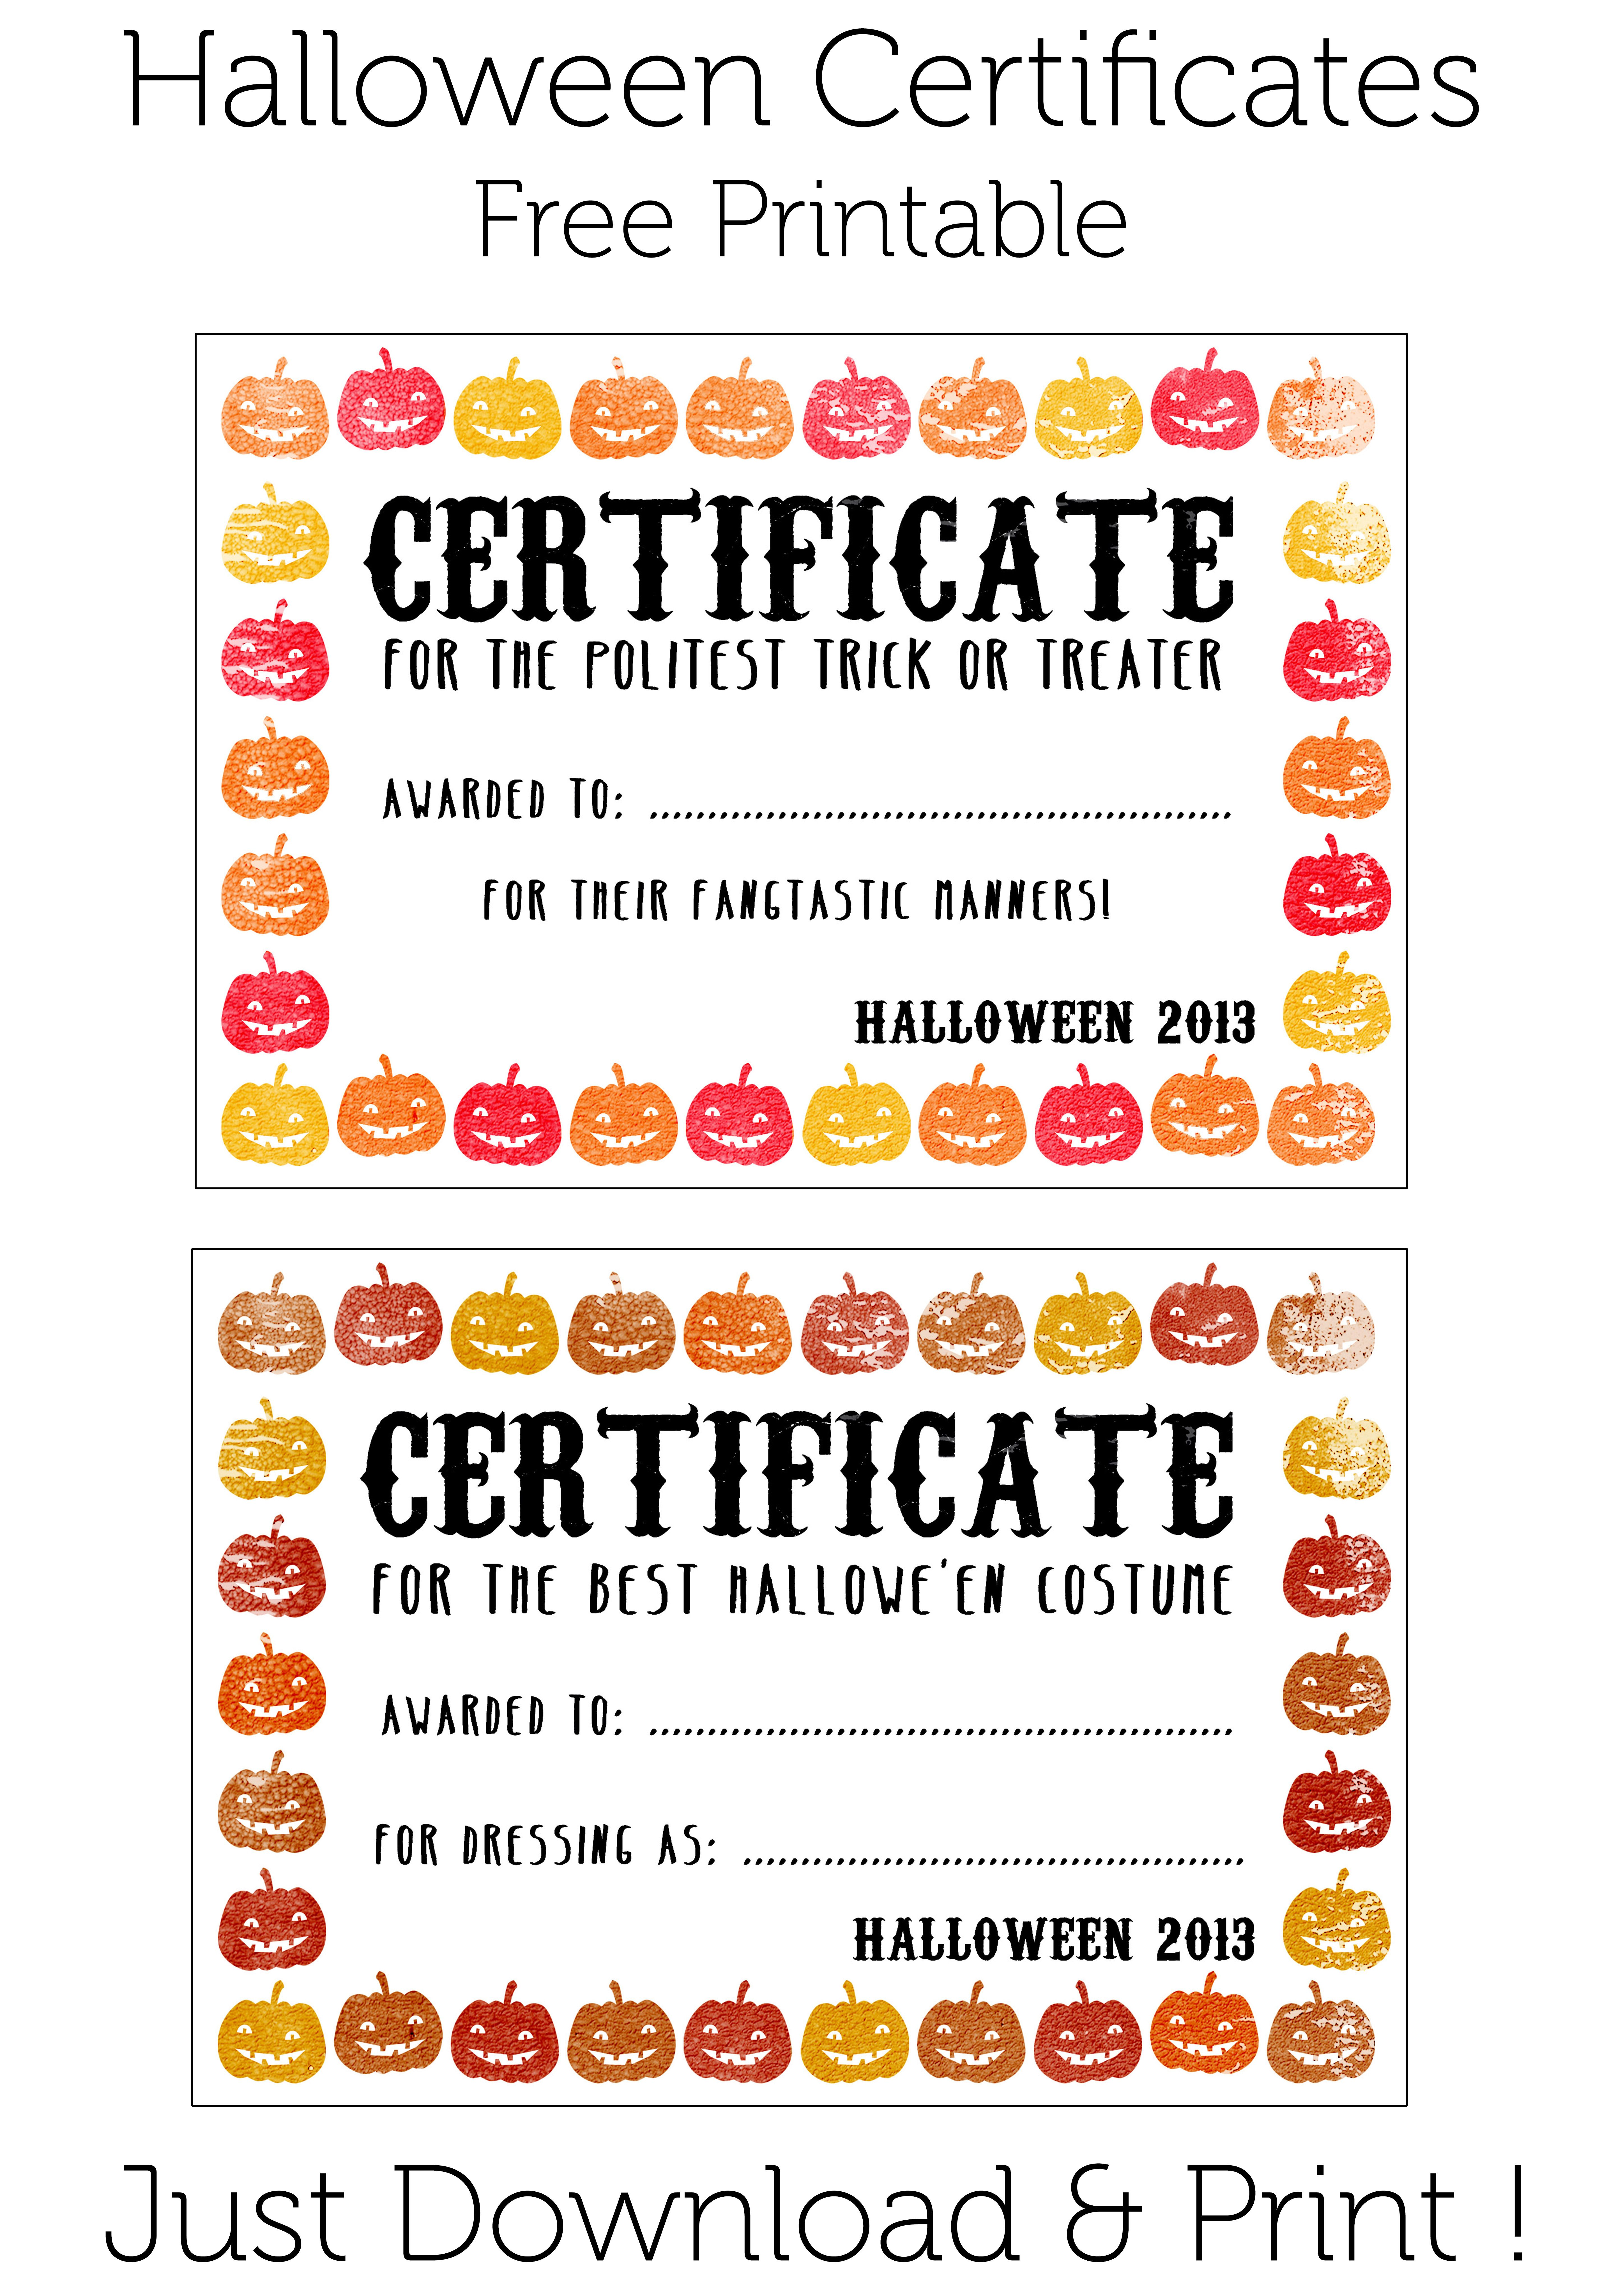 Free Printable Halloween Certificates Frameimage